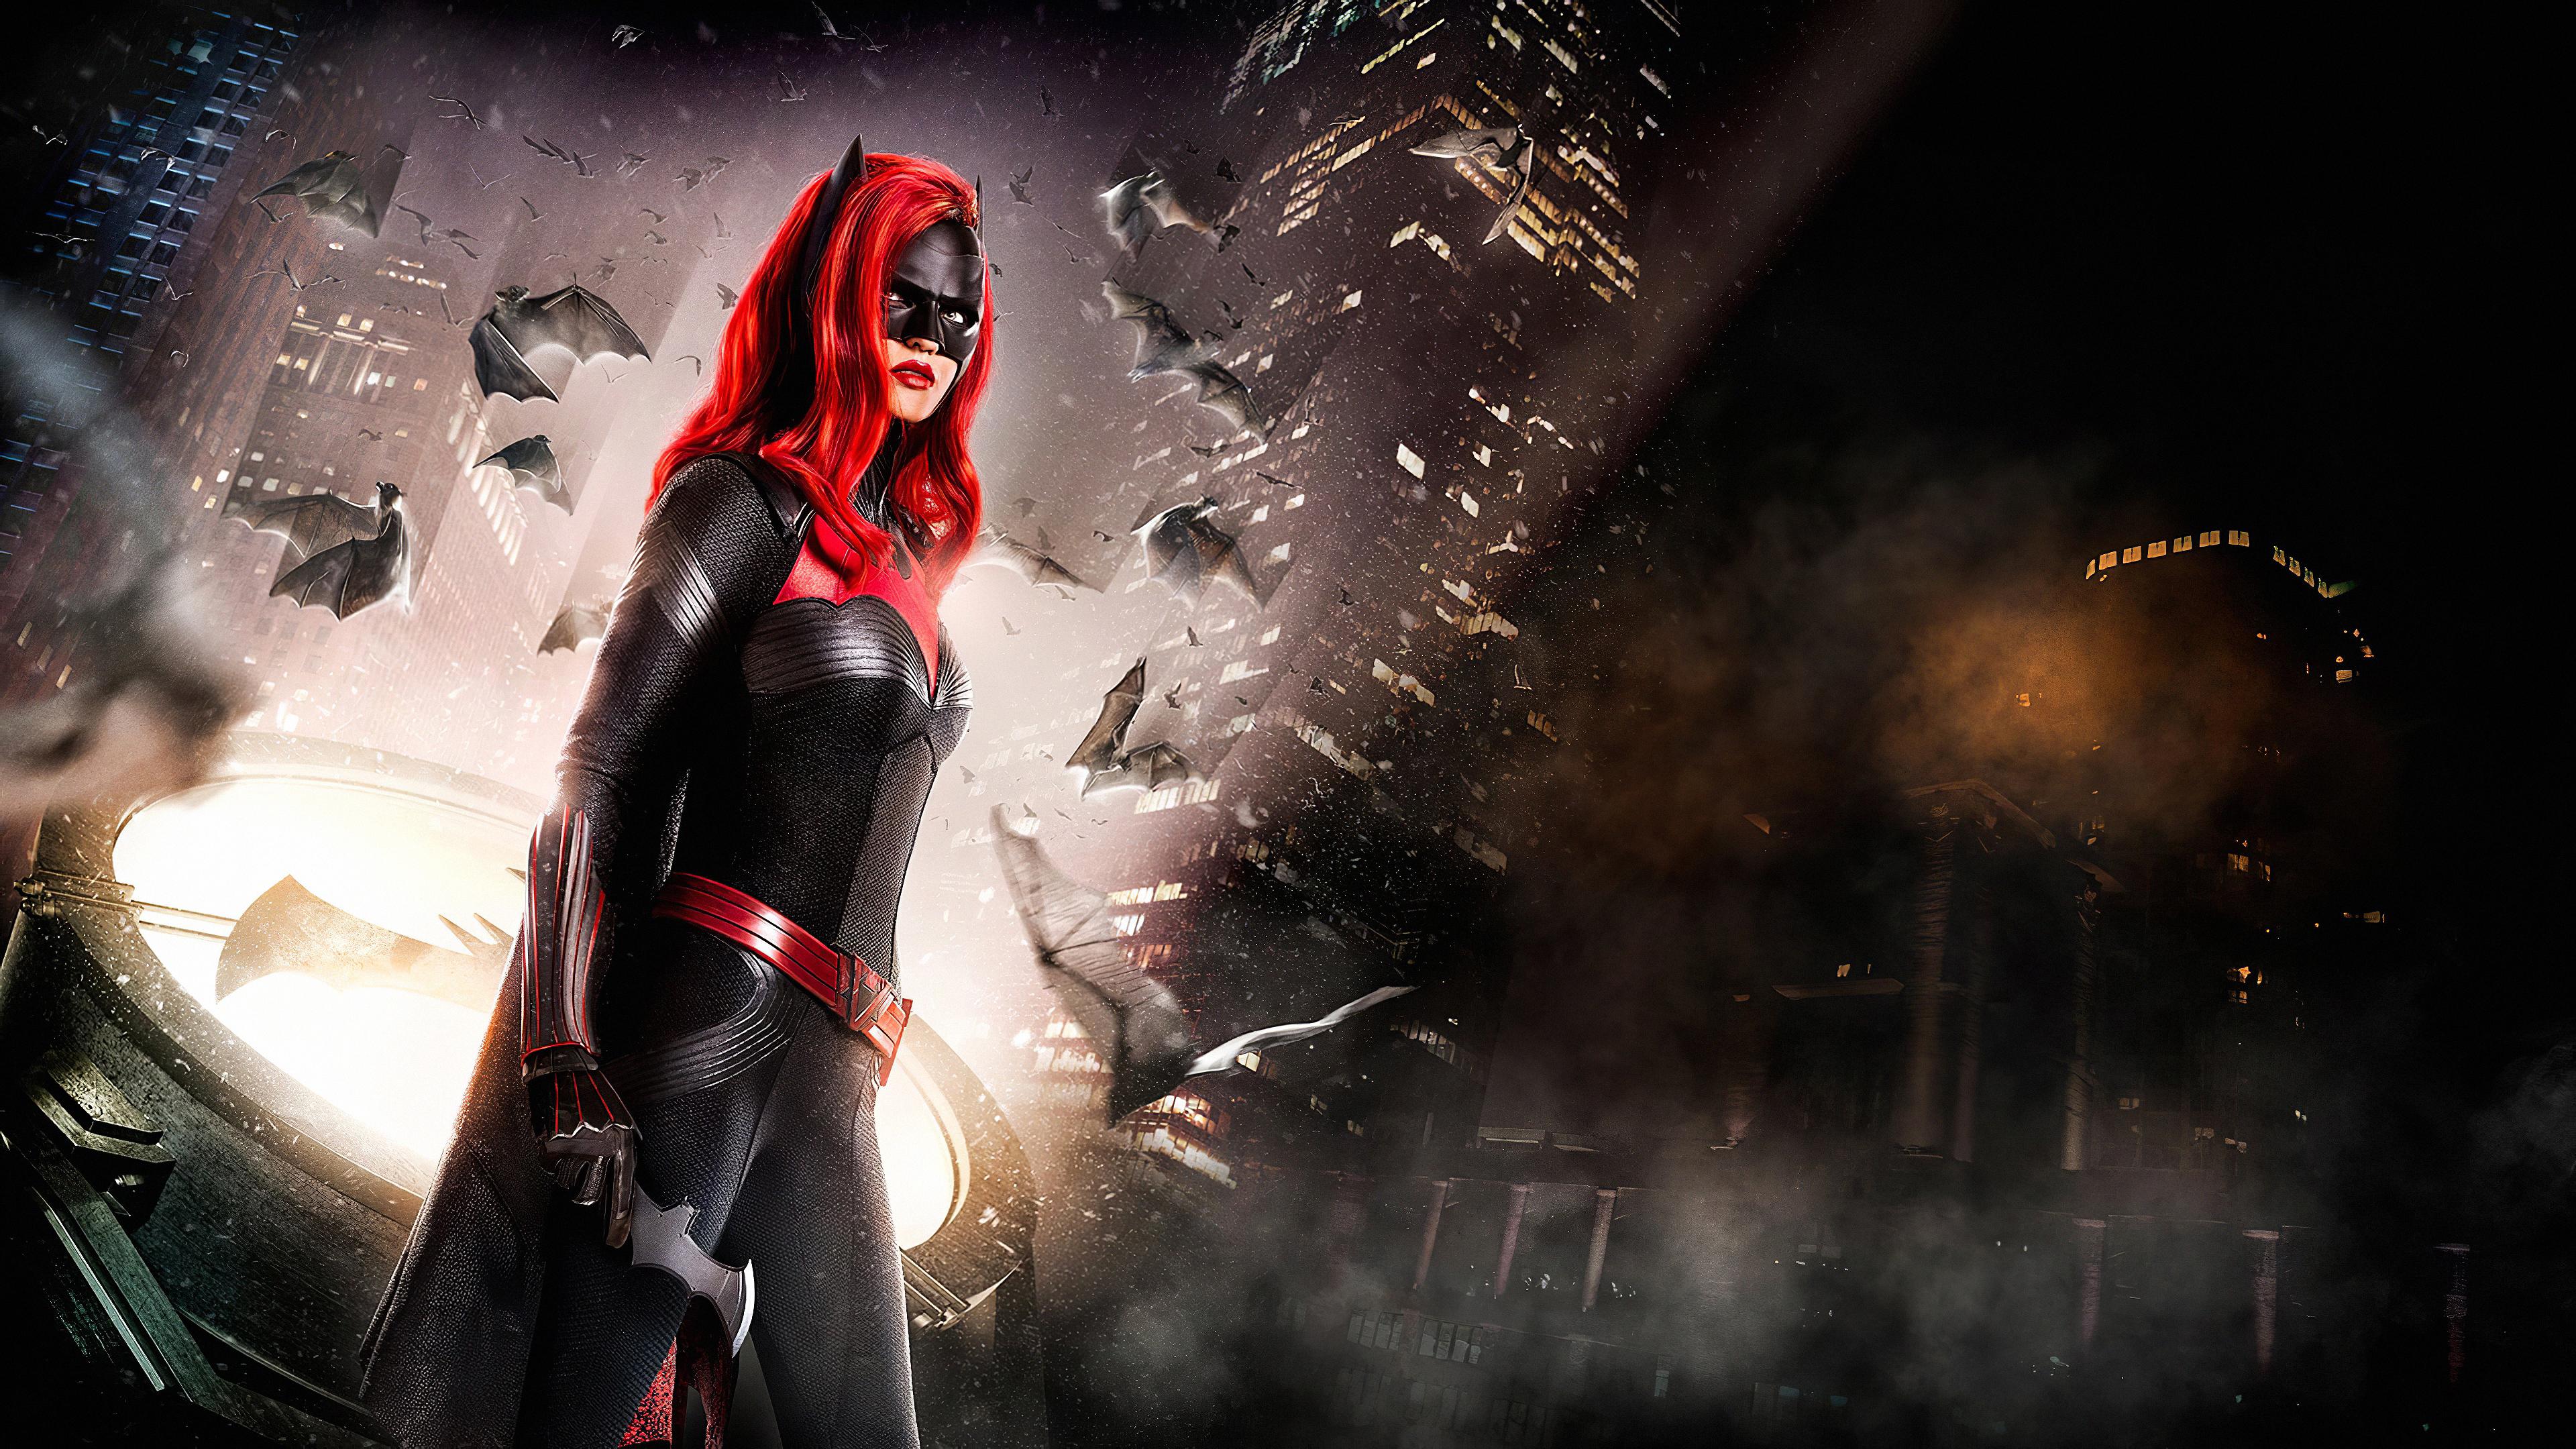 ruby rose as batwoman 2019 1578252750 - Ruby Rose As Batwoman 2019 -